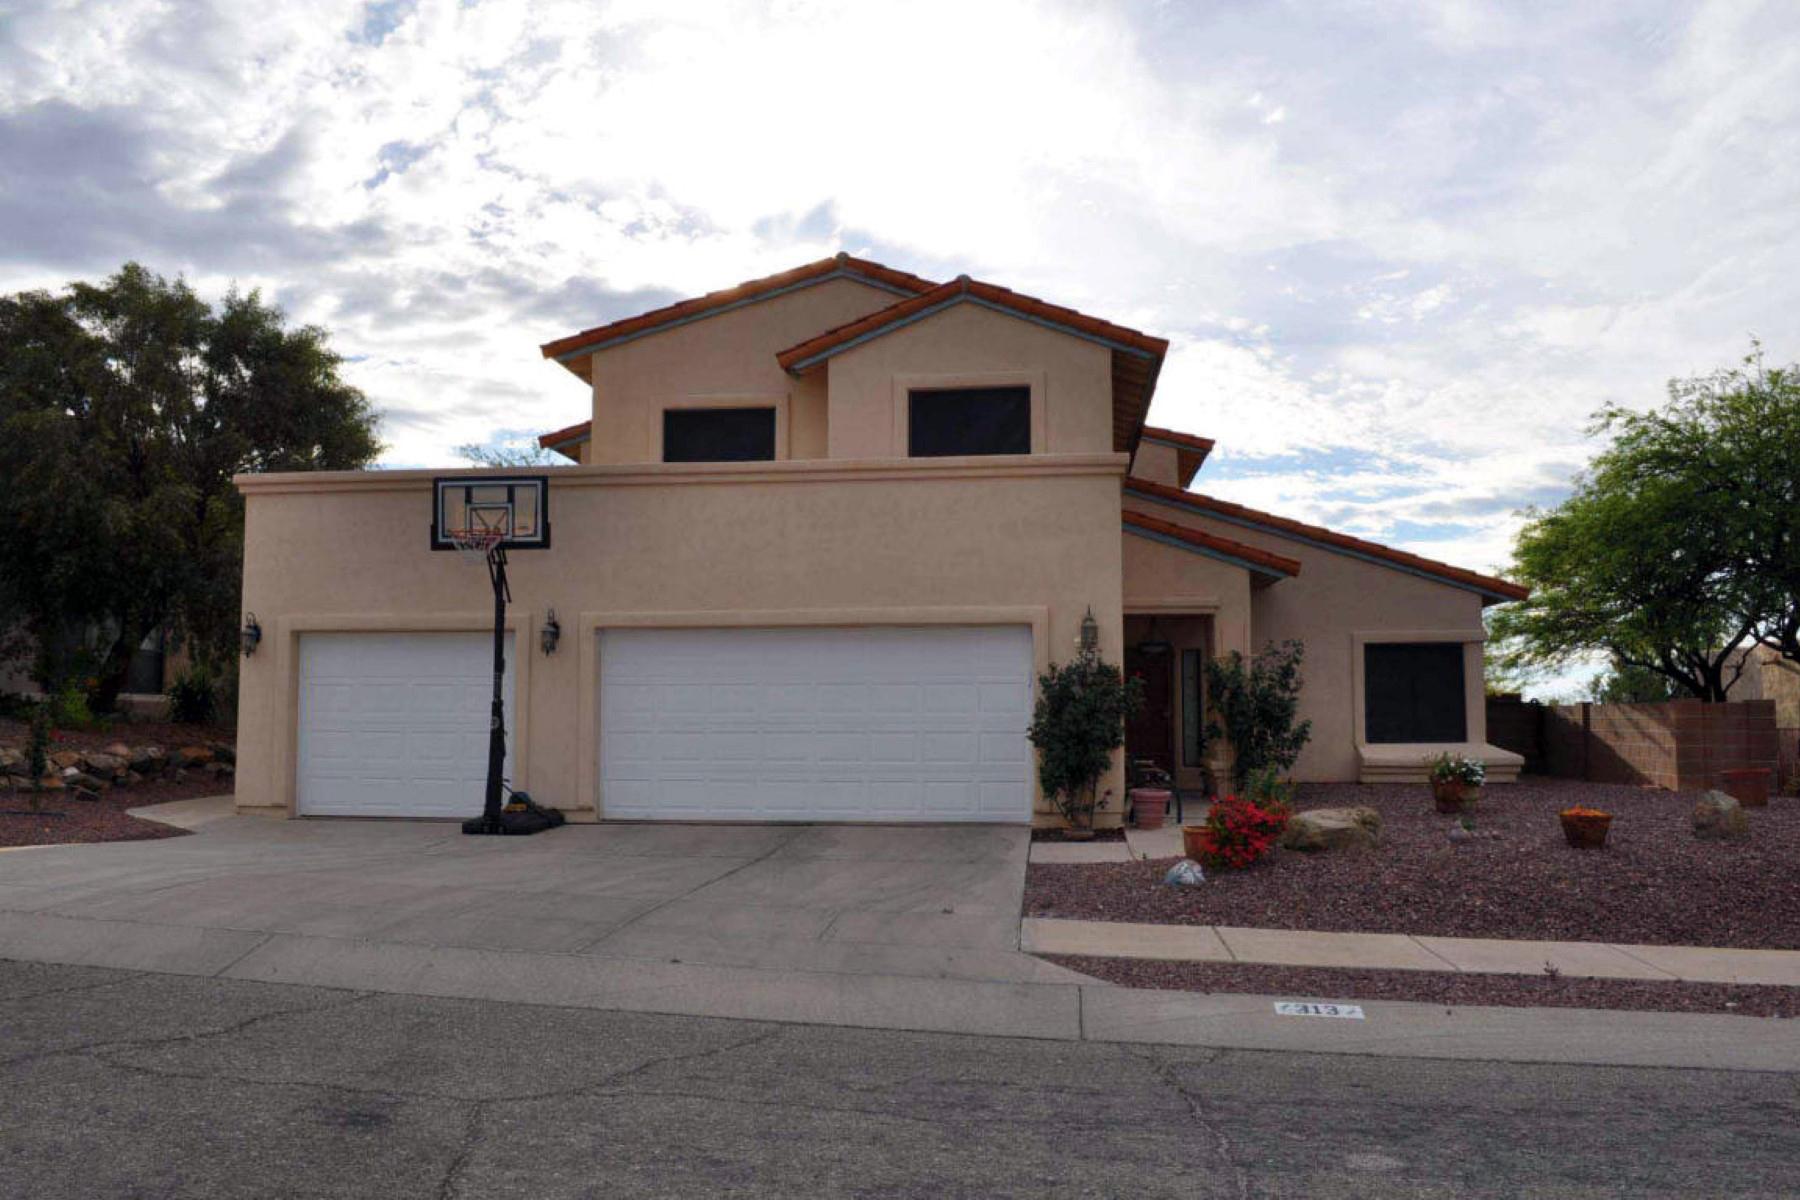 Nhà ở một gia đình vì Bán tại Beautiful Spacious Home in Desired Location 313 N Eastern Slope Loop Tucson, Arizona 85748 Hoa Kỳ